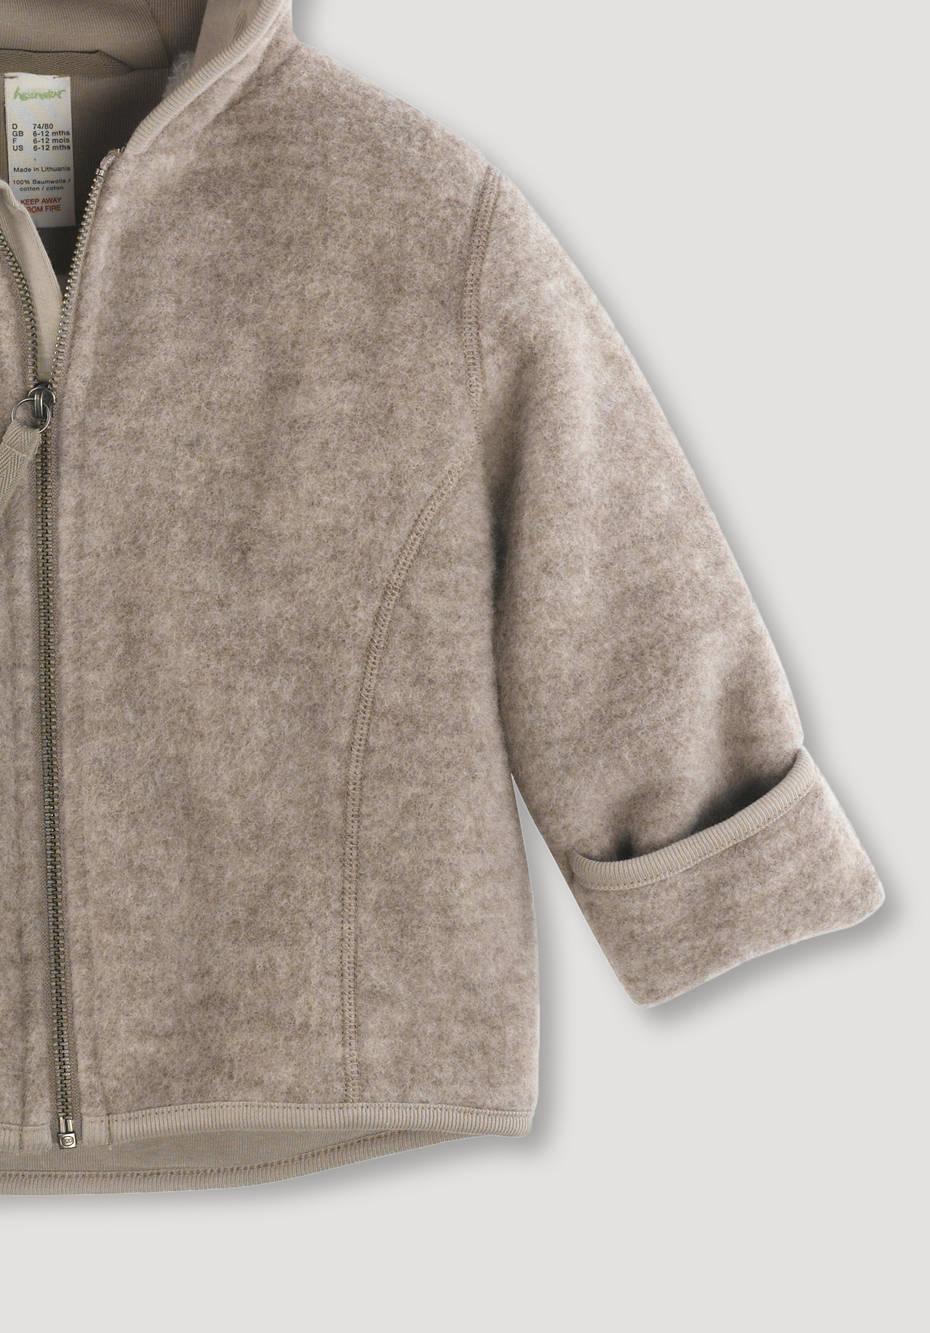 Wool fleece jacket made from pure organic merino wool